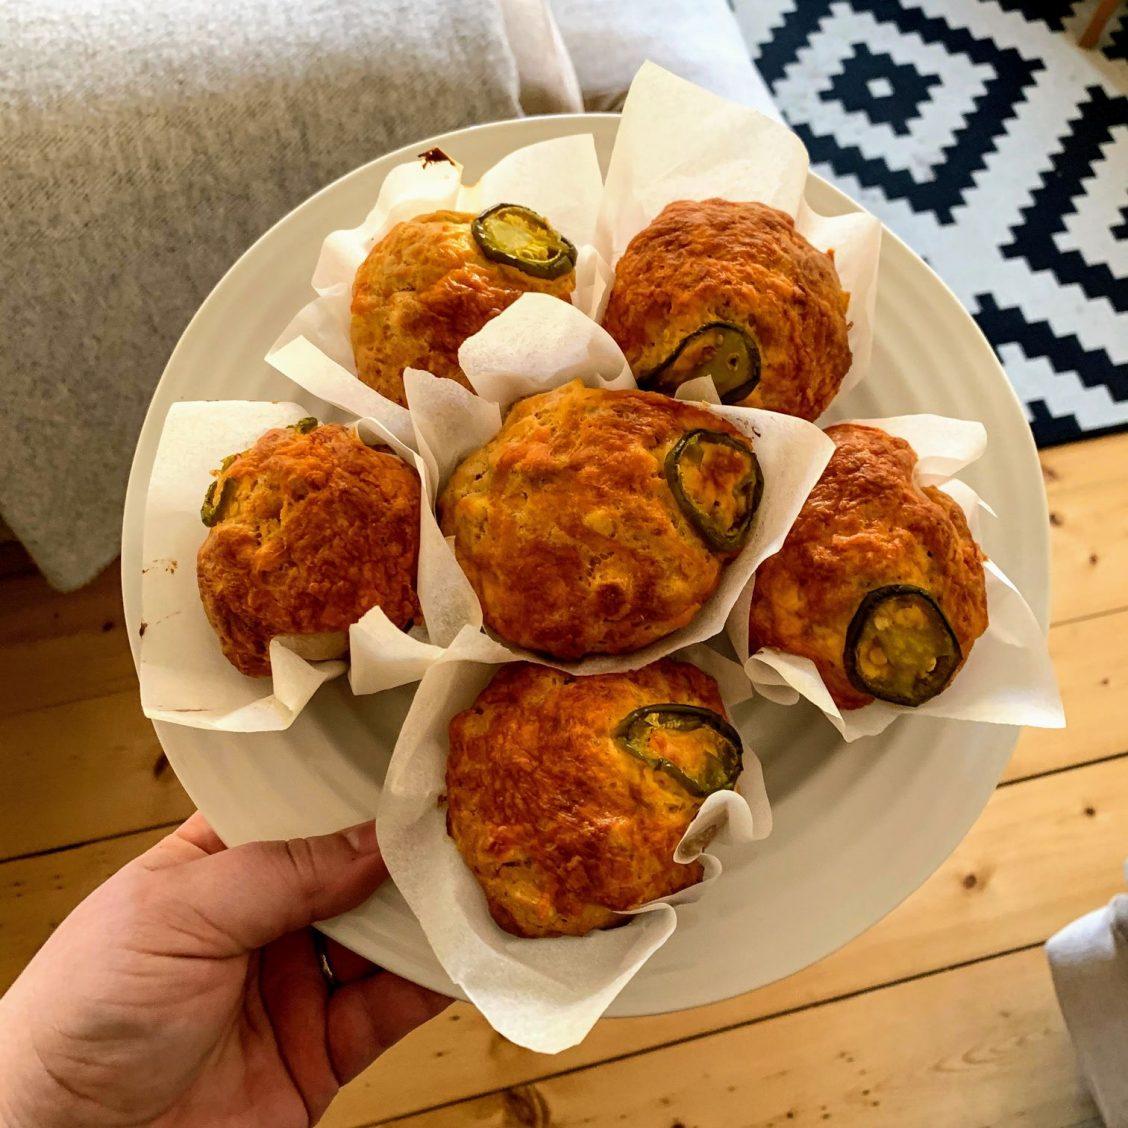 Jalapeño muffins